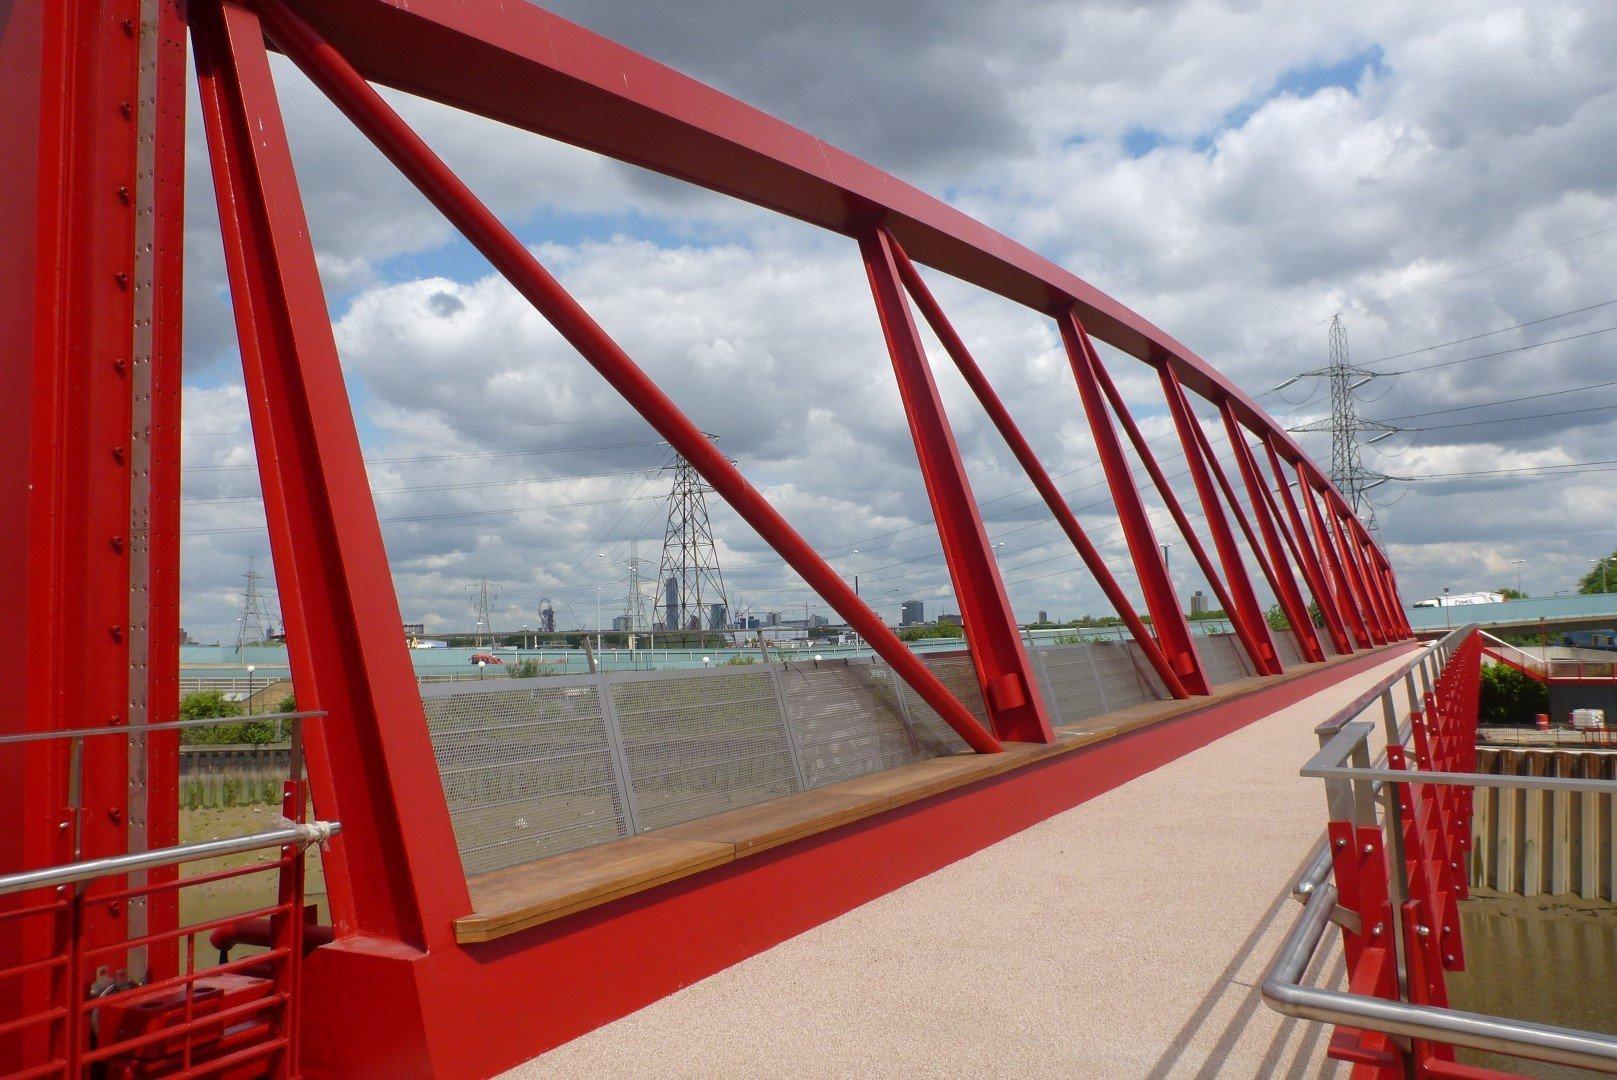 Leamouth pedestrian vertical lift bridge